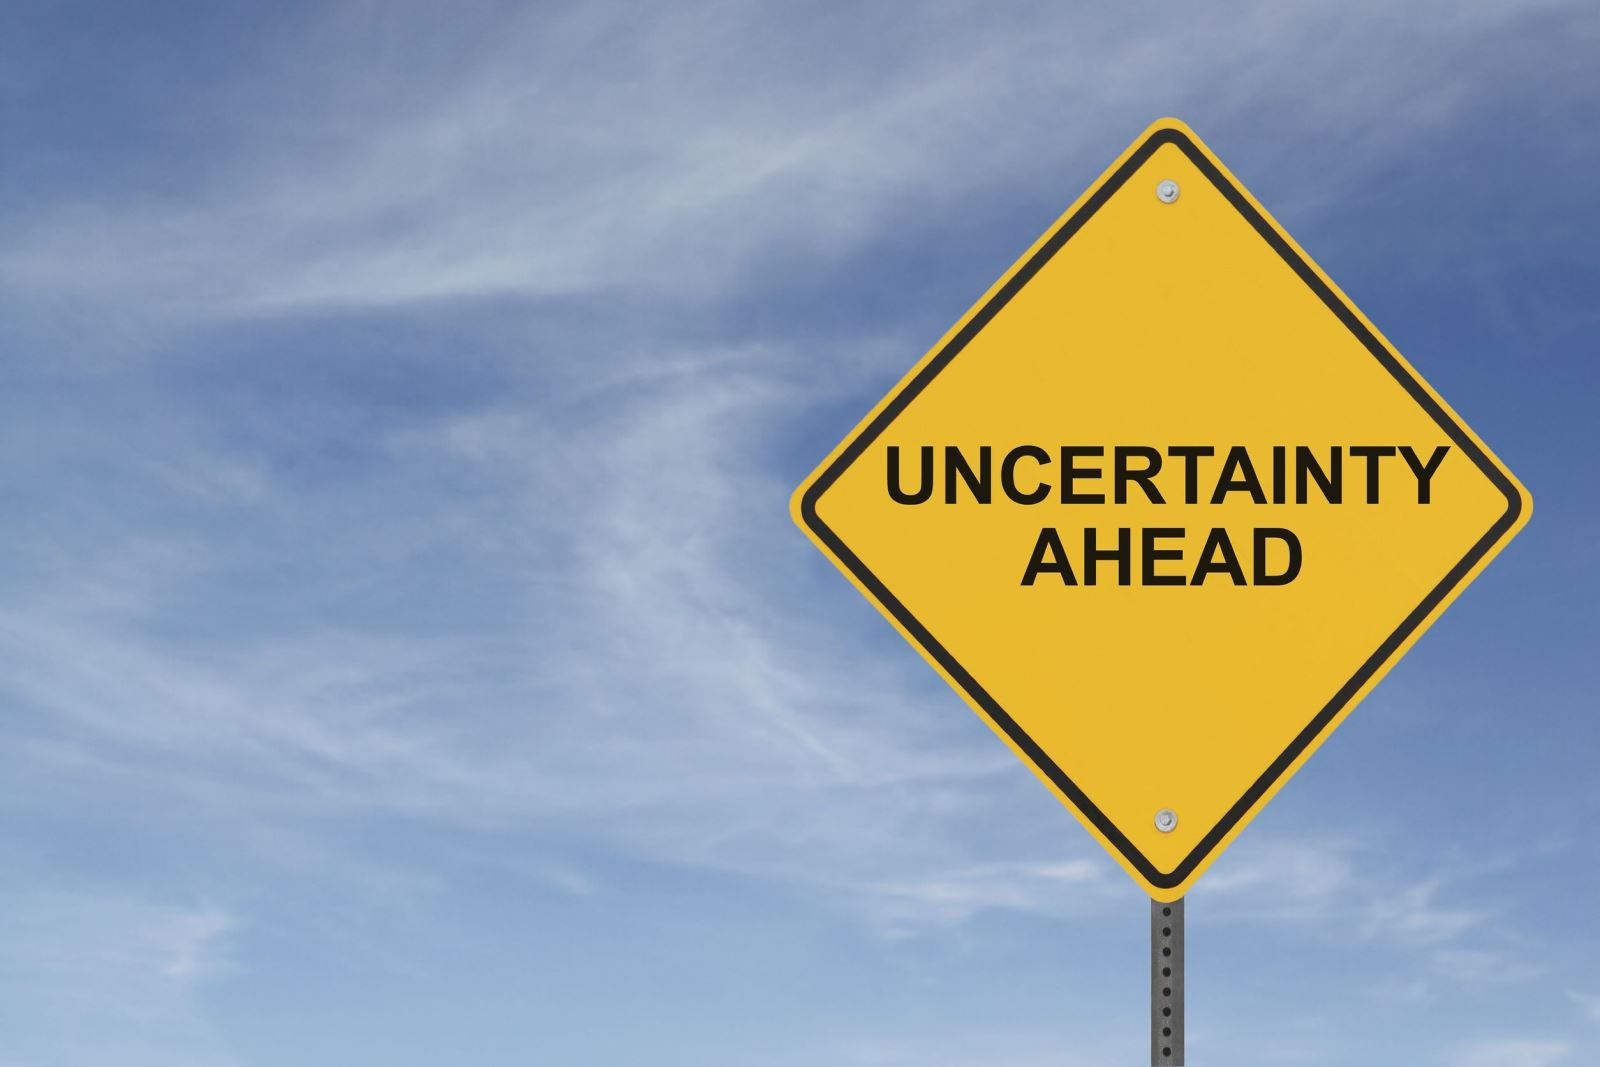 Negative outlooks may impact market